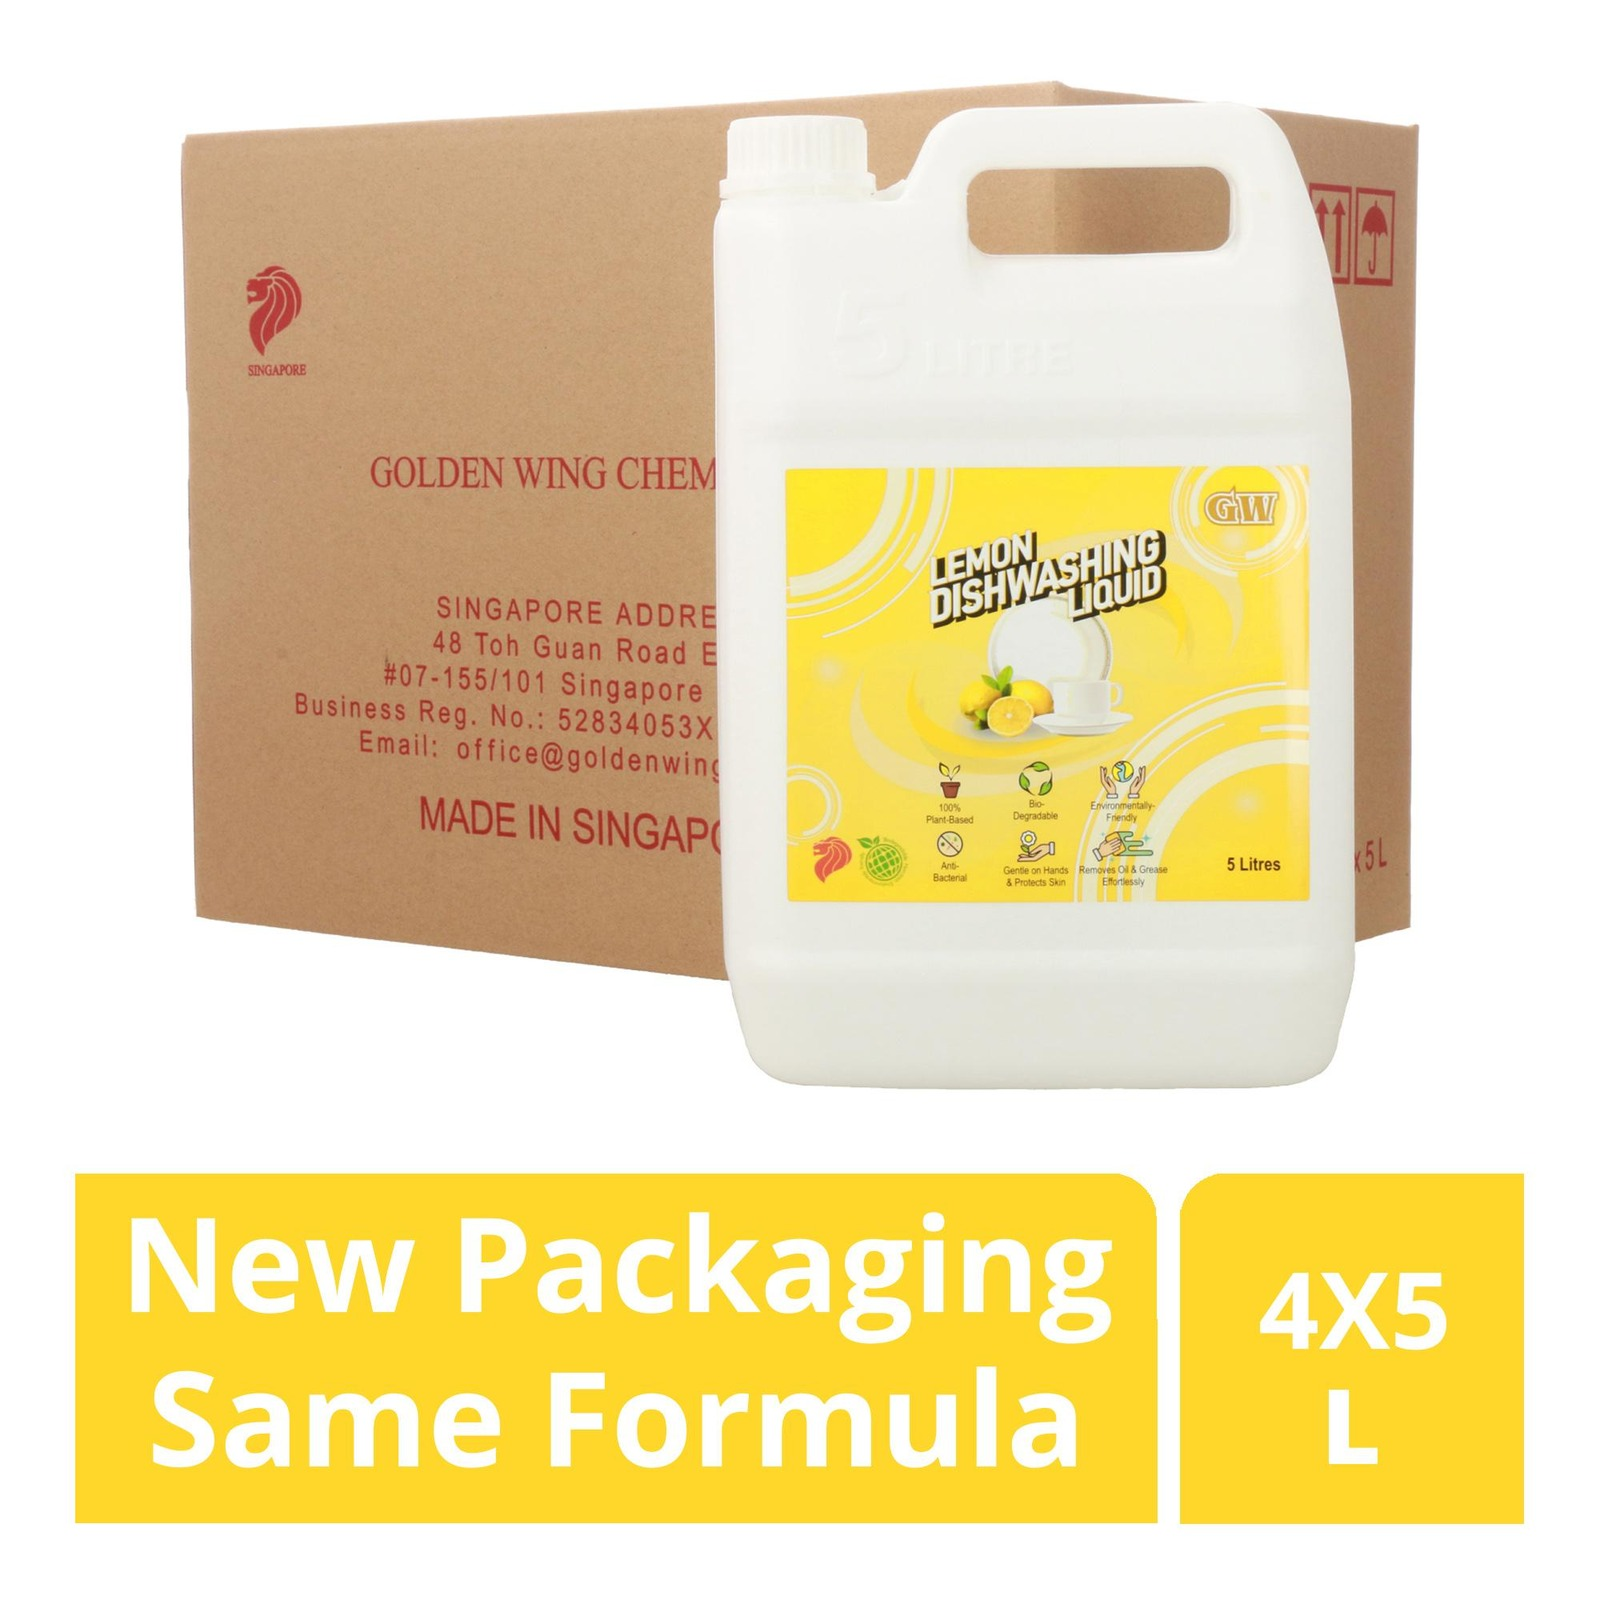 GW Anti-bacterial Dishwashing Liquid Carton - Lemon